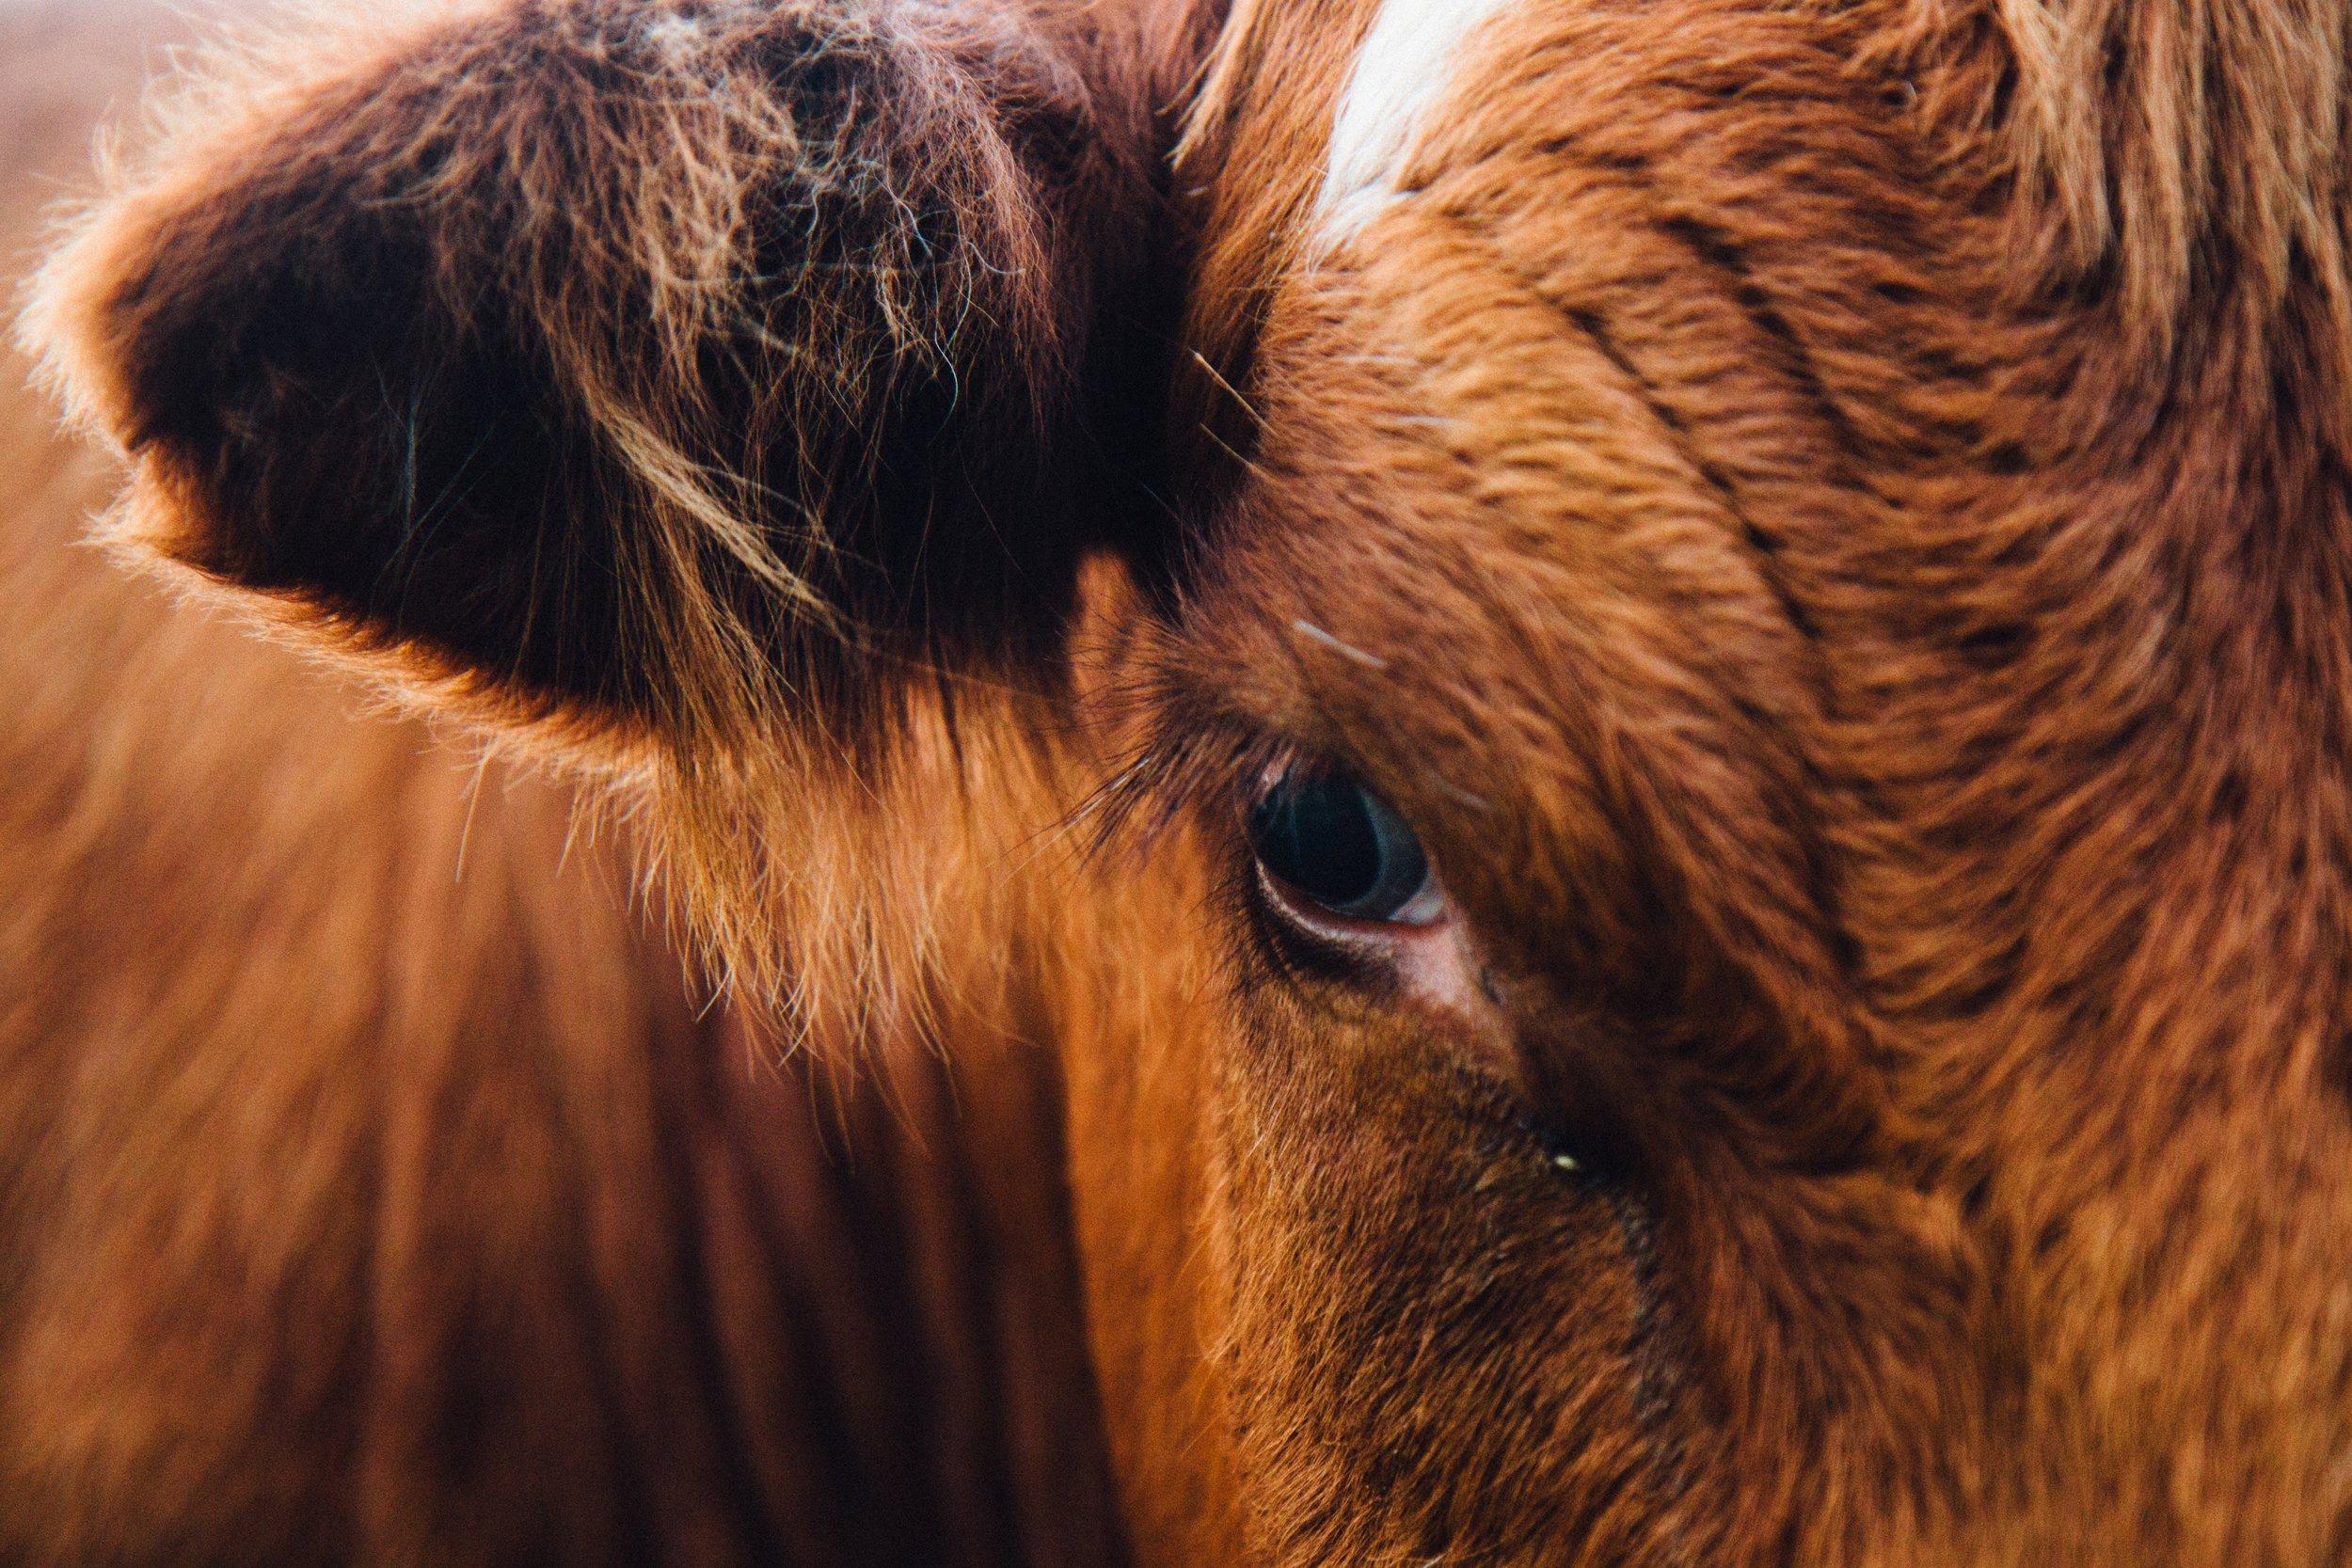 antonio-grosz-brown Cow portrait Up cW.jpg